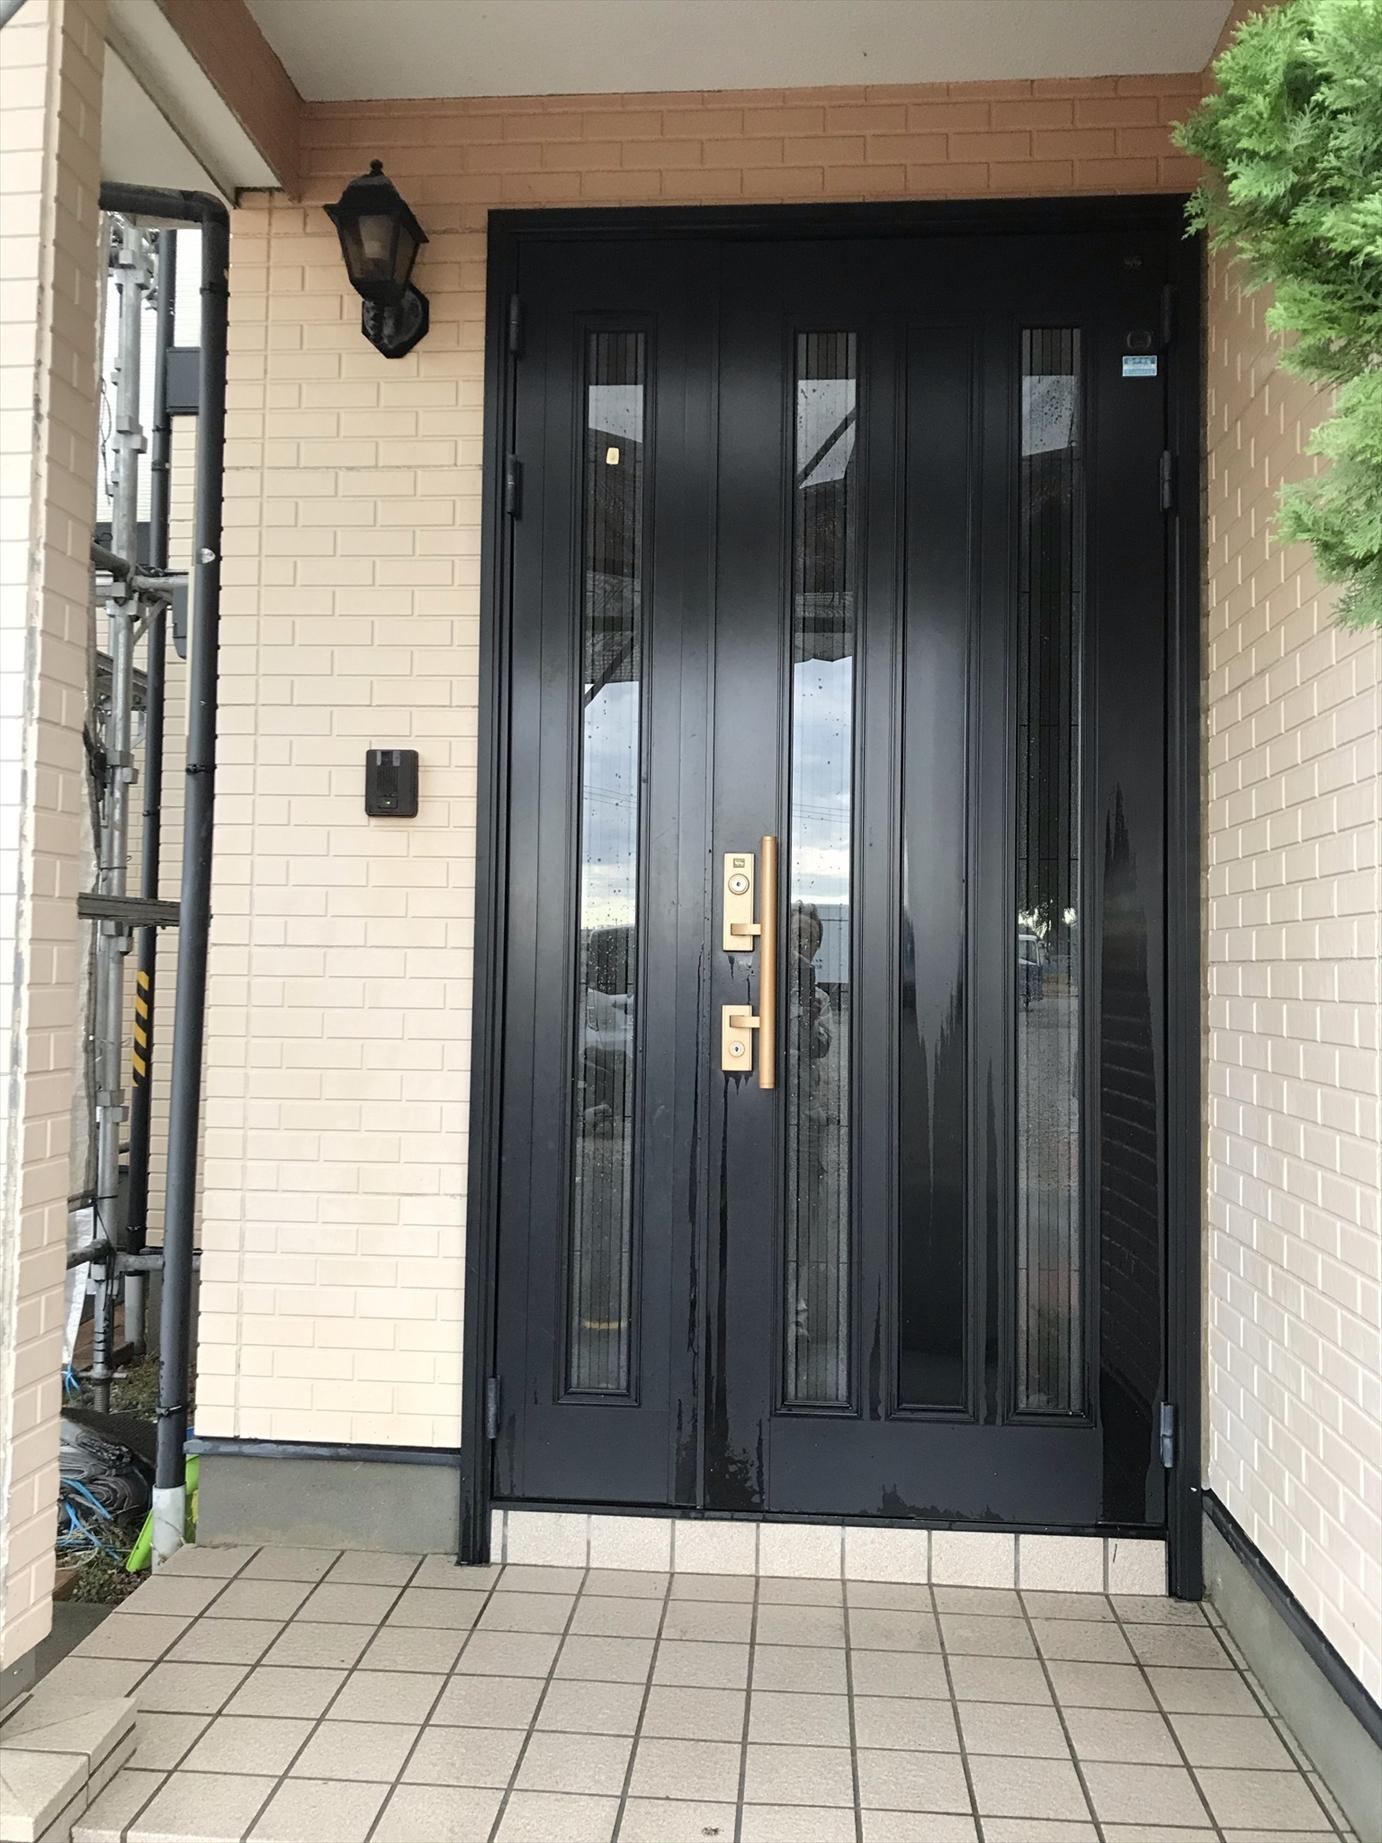 伊奈町賃貸一軒家塗り替え塗装前の高圧洗浄玄関廻り作業